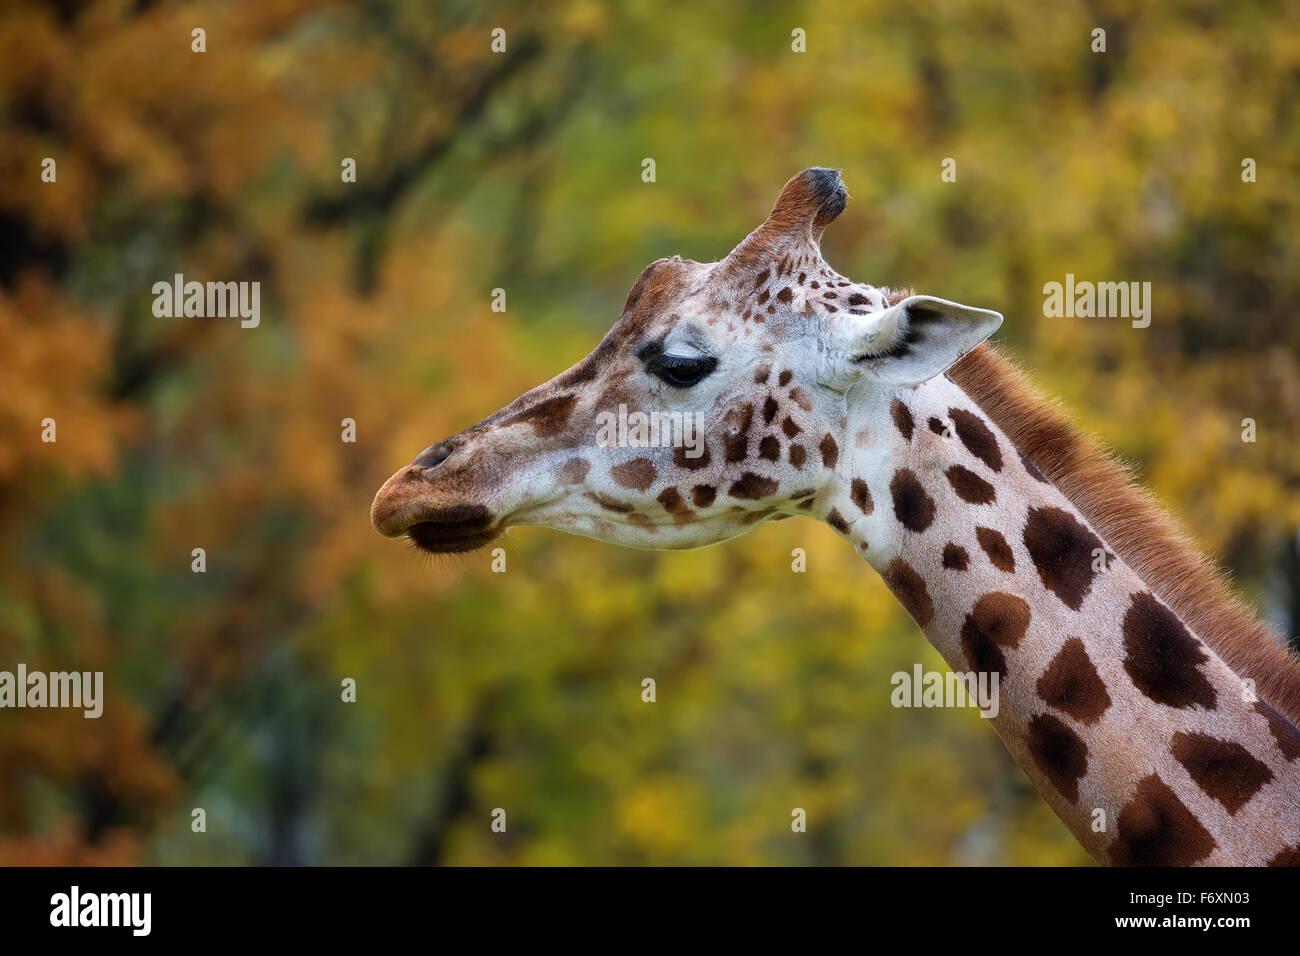 Jirafa, un perfil Imagen De Stock